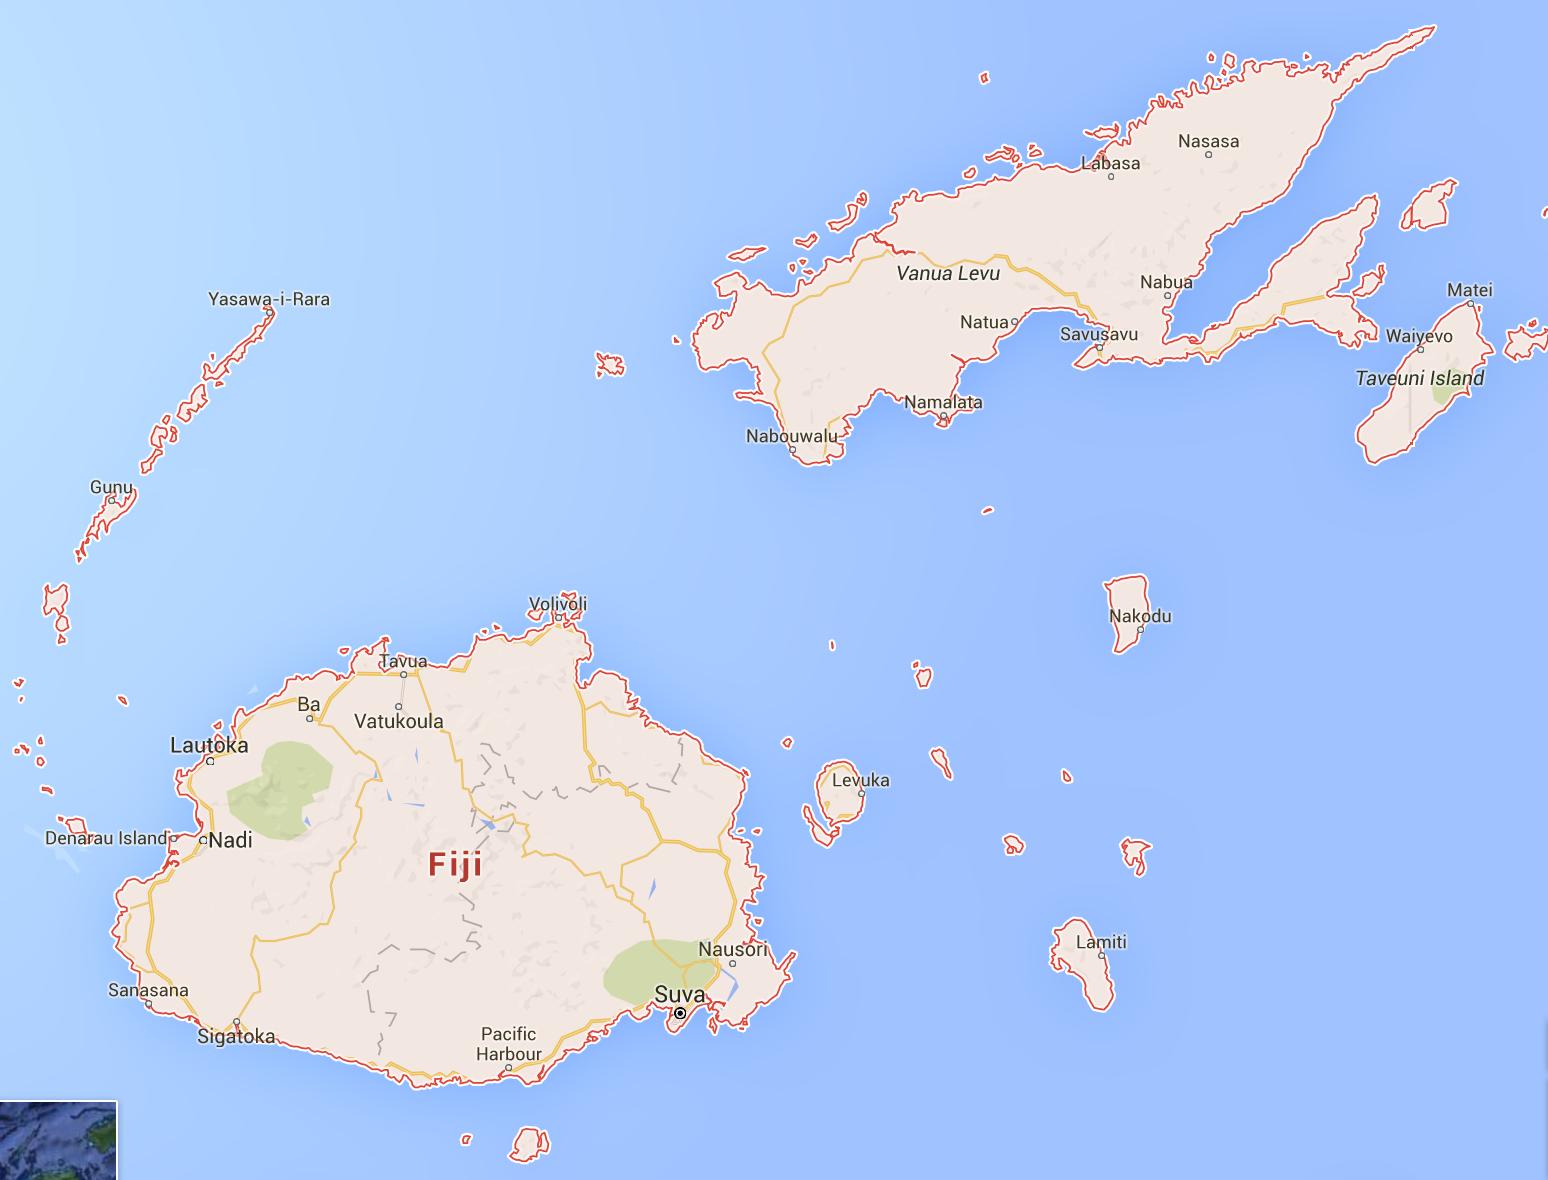 Fiji-map Map Fiji on rapa nui map, french guiana map, aruba map, belgium map, china map, ireland map, world map, burundi map, azerbaijan map, brazil map, bangladesh map, croatia map, bora bora map, austria map, cook islands map, cameroon map, burma map, australia map, mexico map, mariana islands map, caribbean map, international date line map, cambodia map, bulgaria map, qatar map, benin map, cuba map, ghana map, belize map, viti levu map, south pacific map, argentina map, africa map, holland map, yasawa islands map, france map,